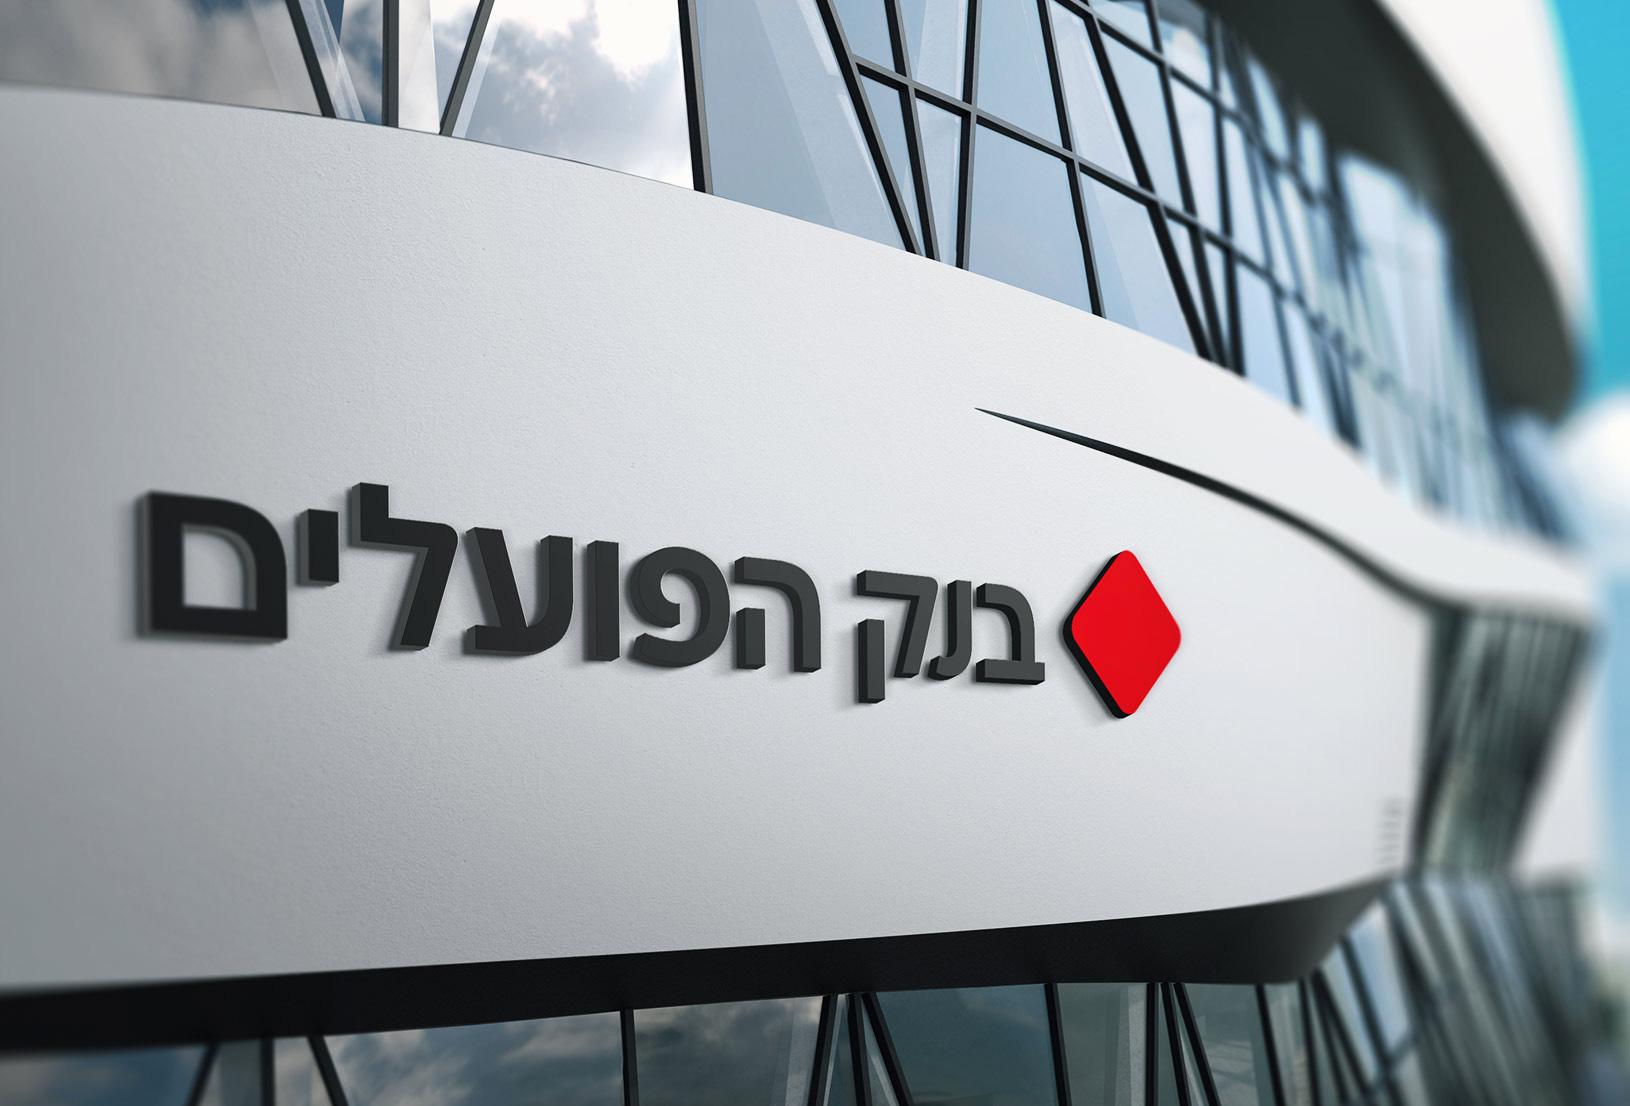 以色列工人银行Bank Hapoalim品牌形象设计